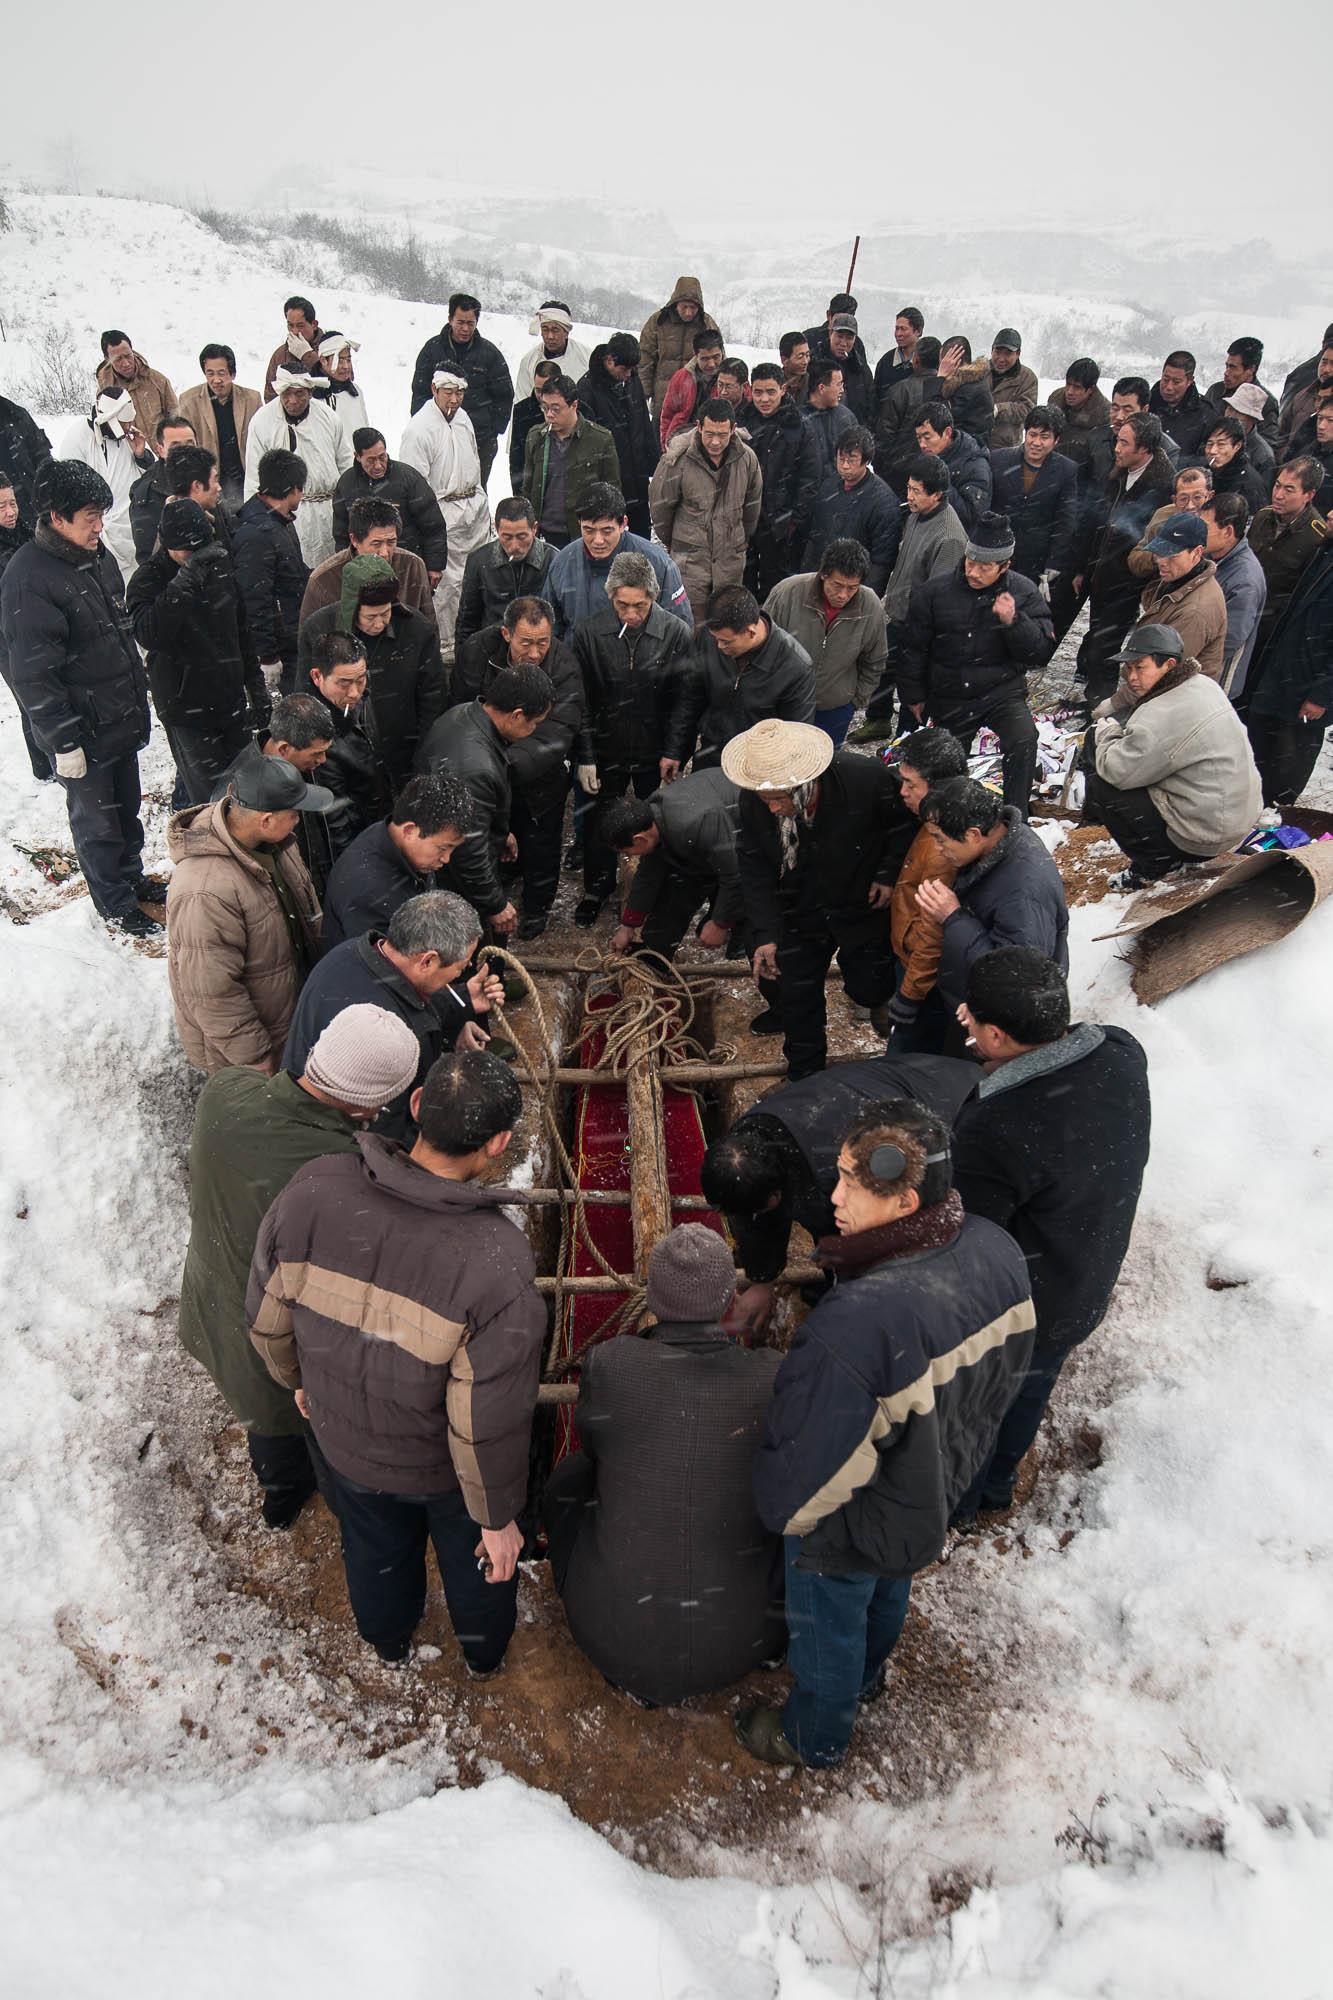 lowering the casket